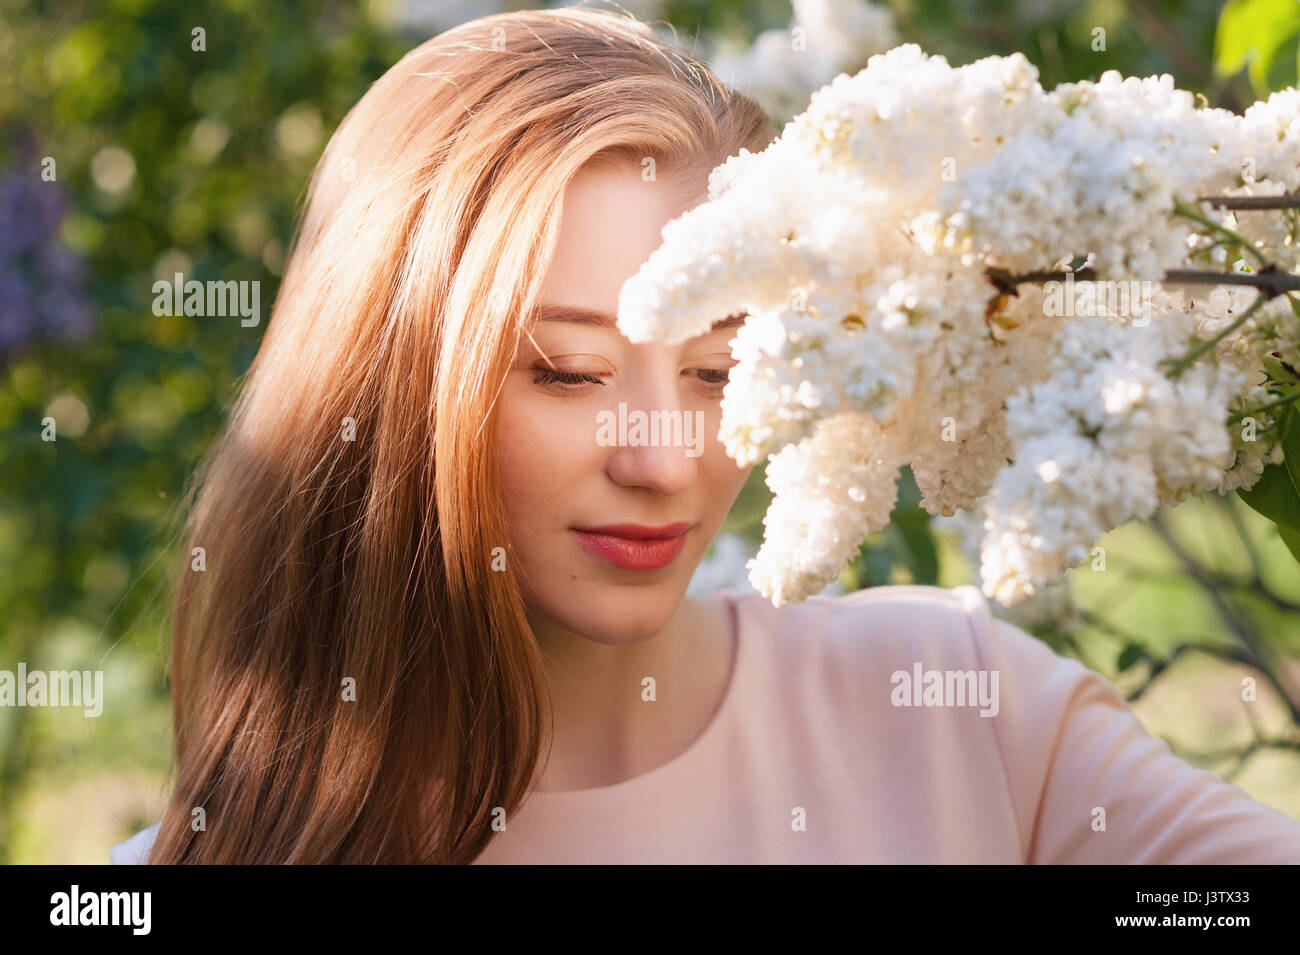 Beautiful woman with flowers of lilac skincare stock photo beautiful woman with flowers of lilac skincare izmirmasajfo